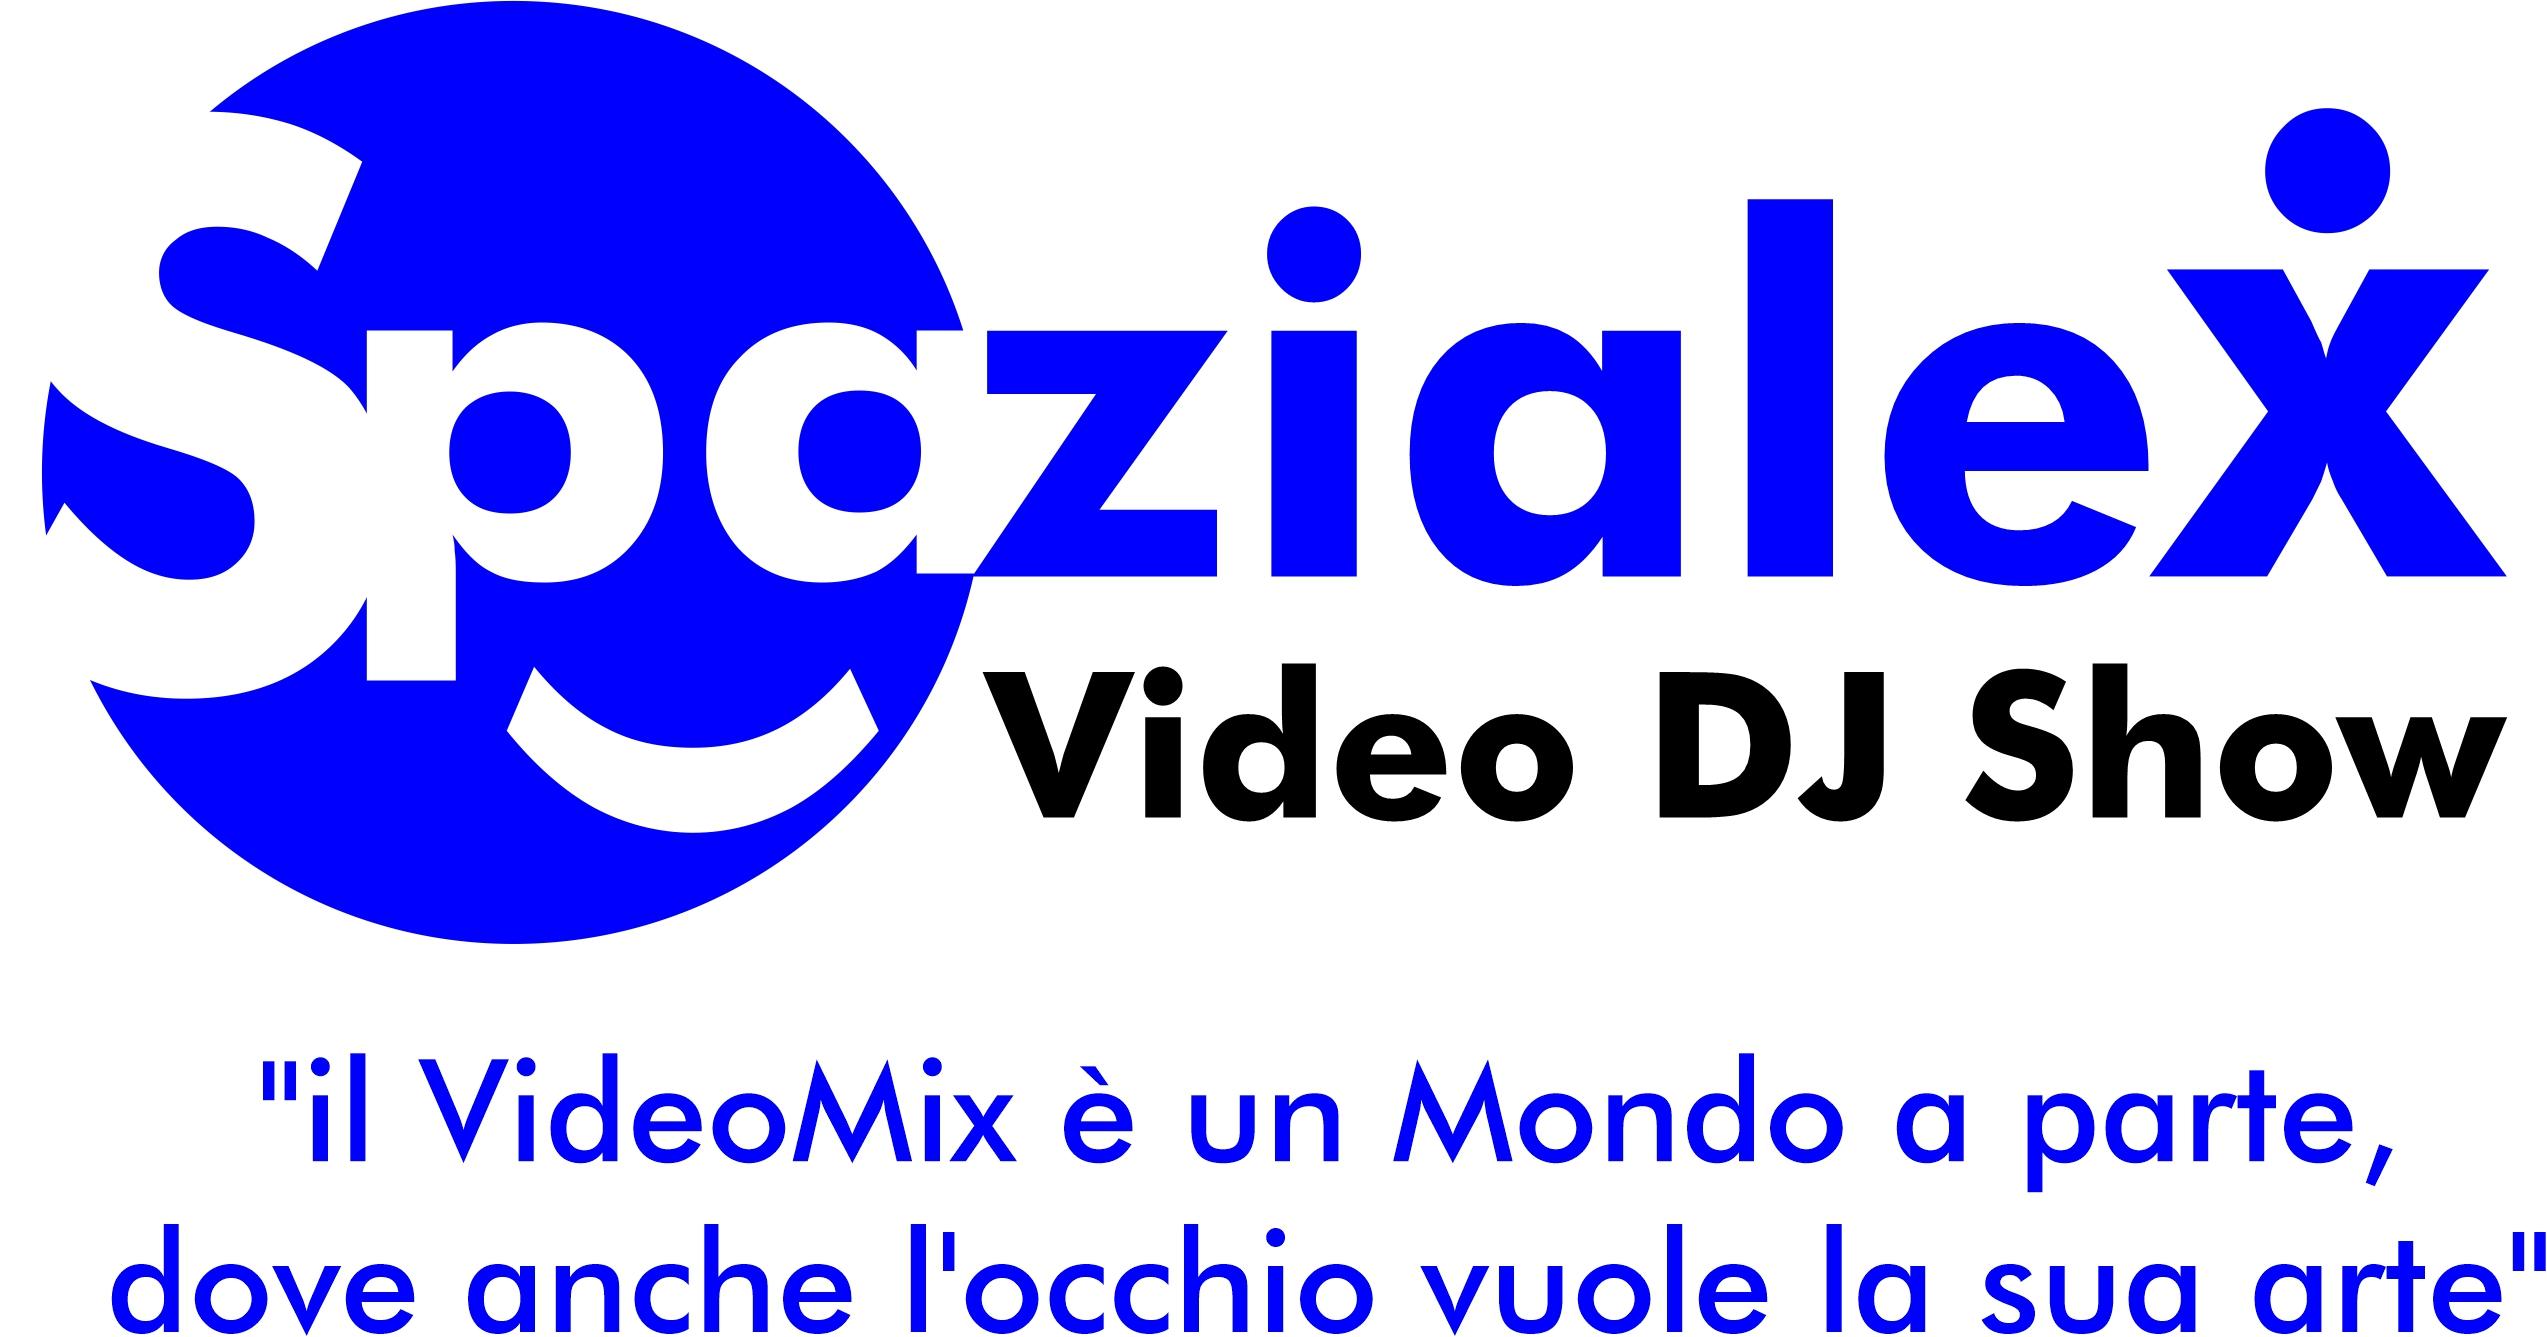 Logo Spazialex Video DJ